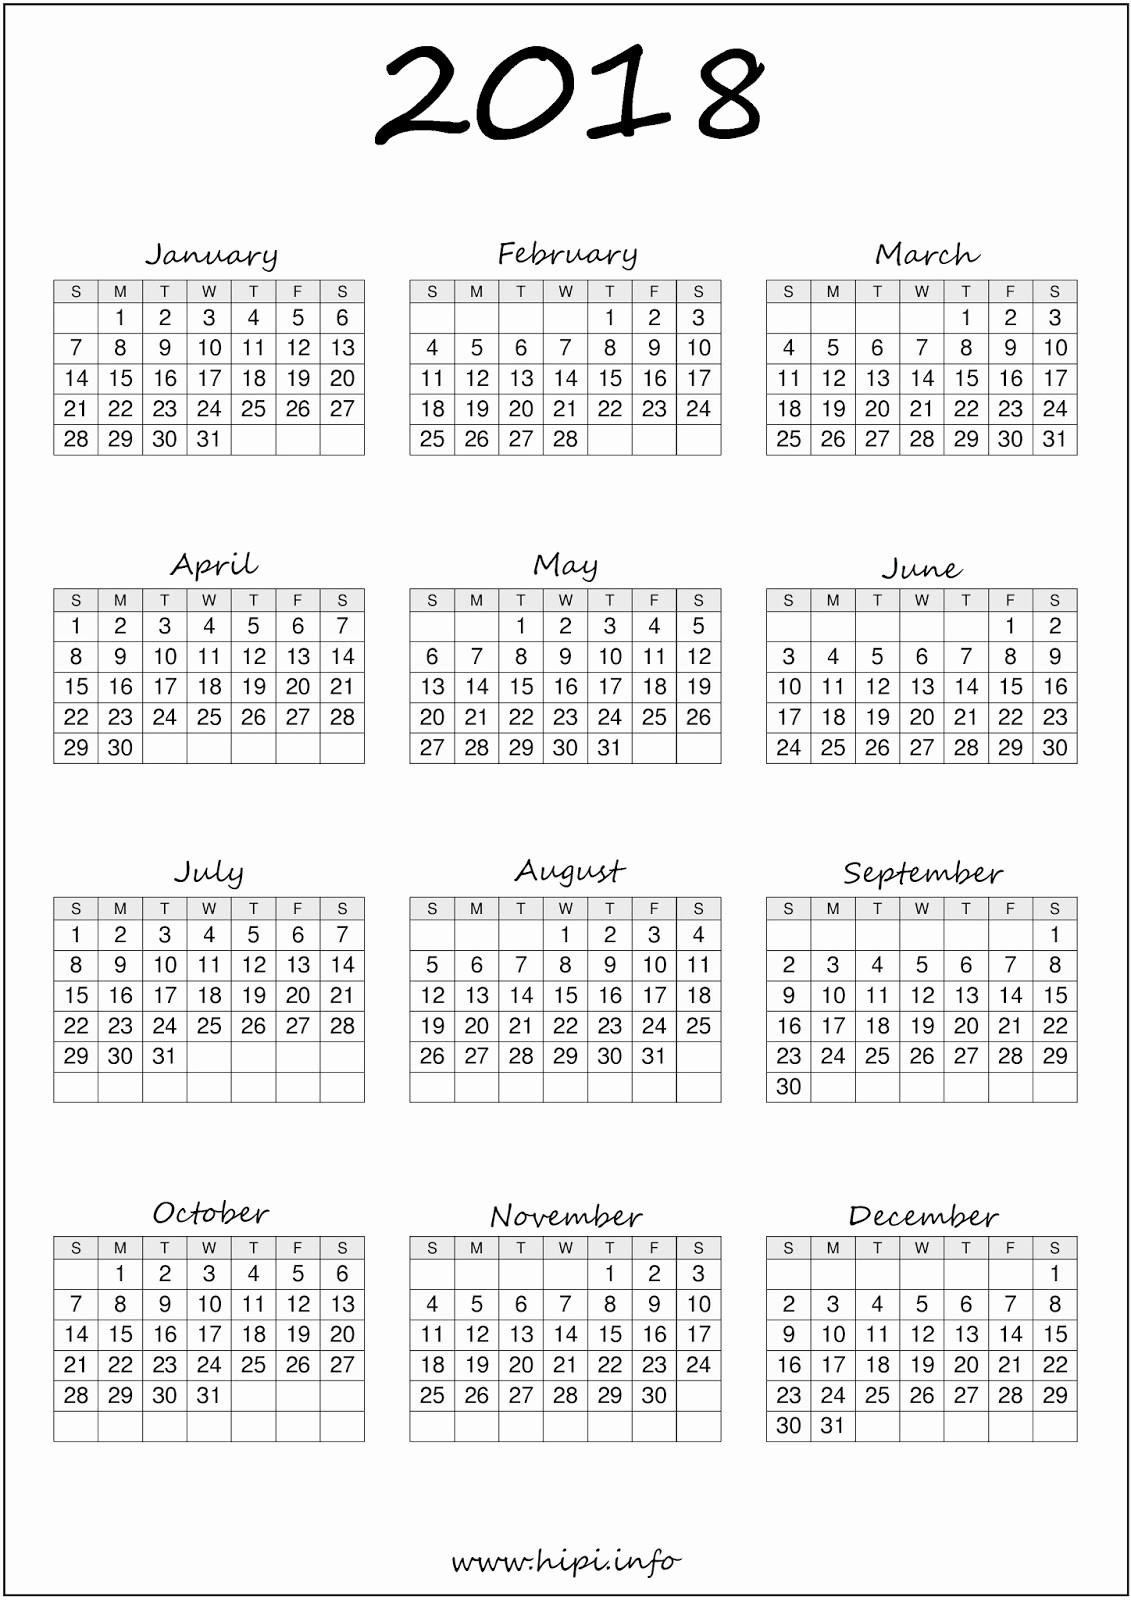 Free Printable Yearly Calendar 2018 Fresh Twitter Headers Covers Wallpapers Calendars